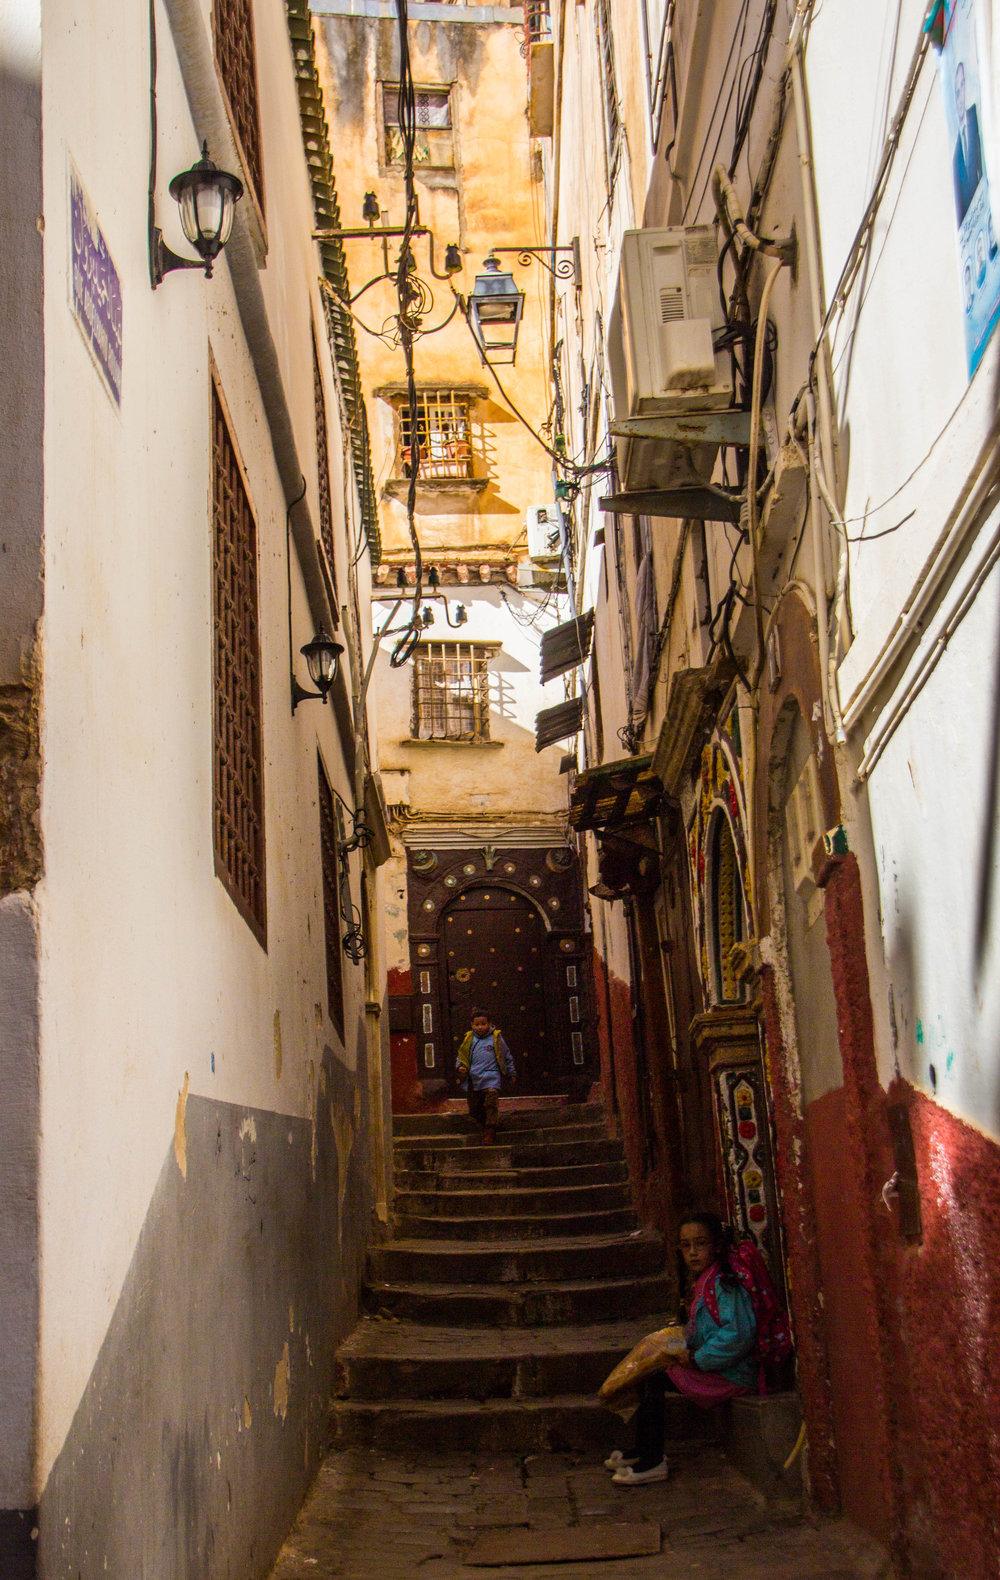 casbah-photography-algiers-algeria-alger-13.jpg